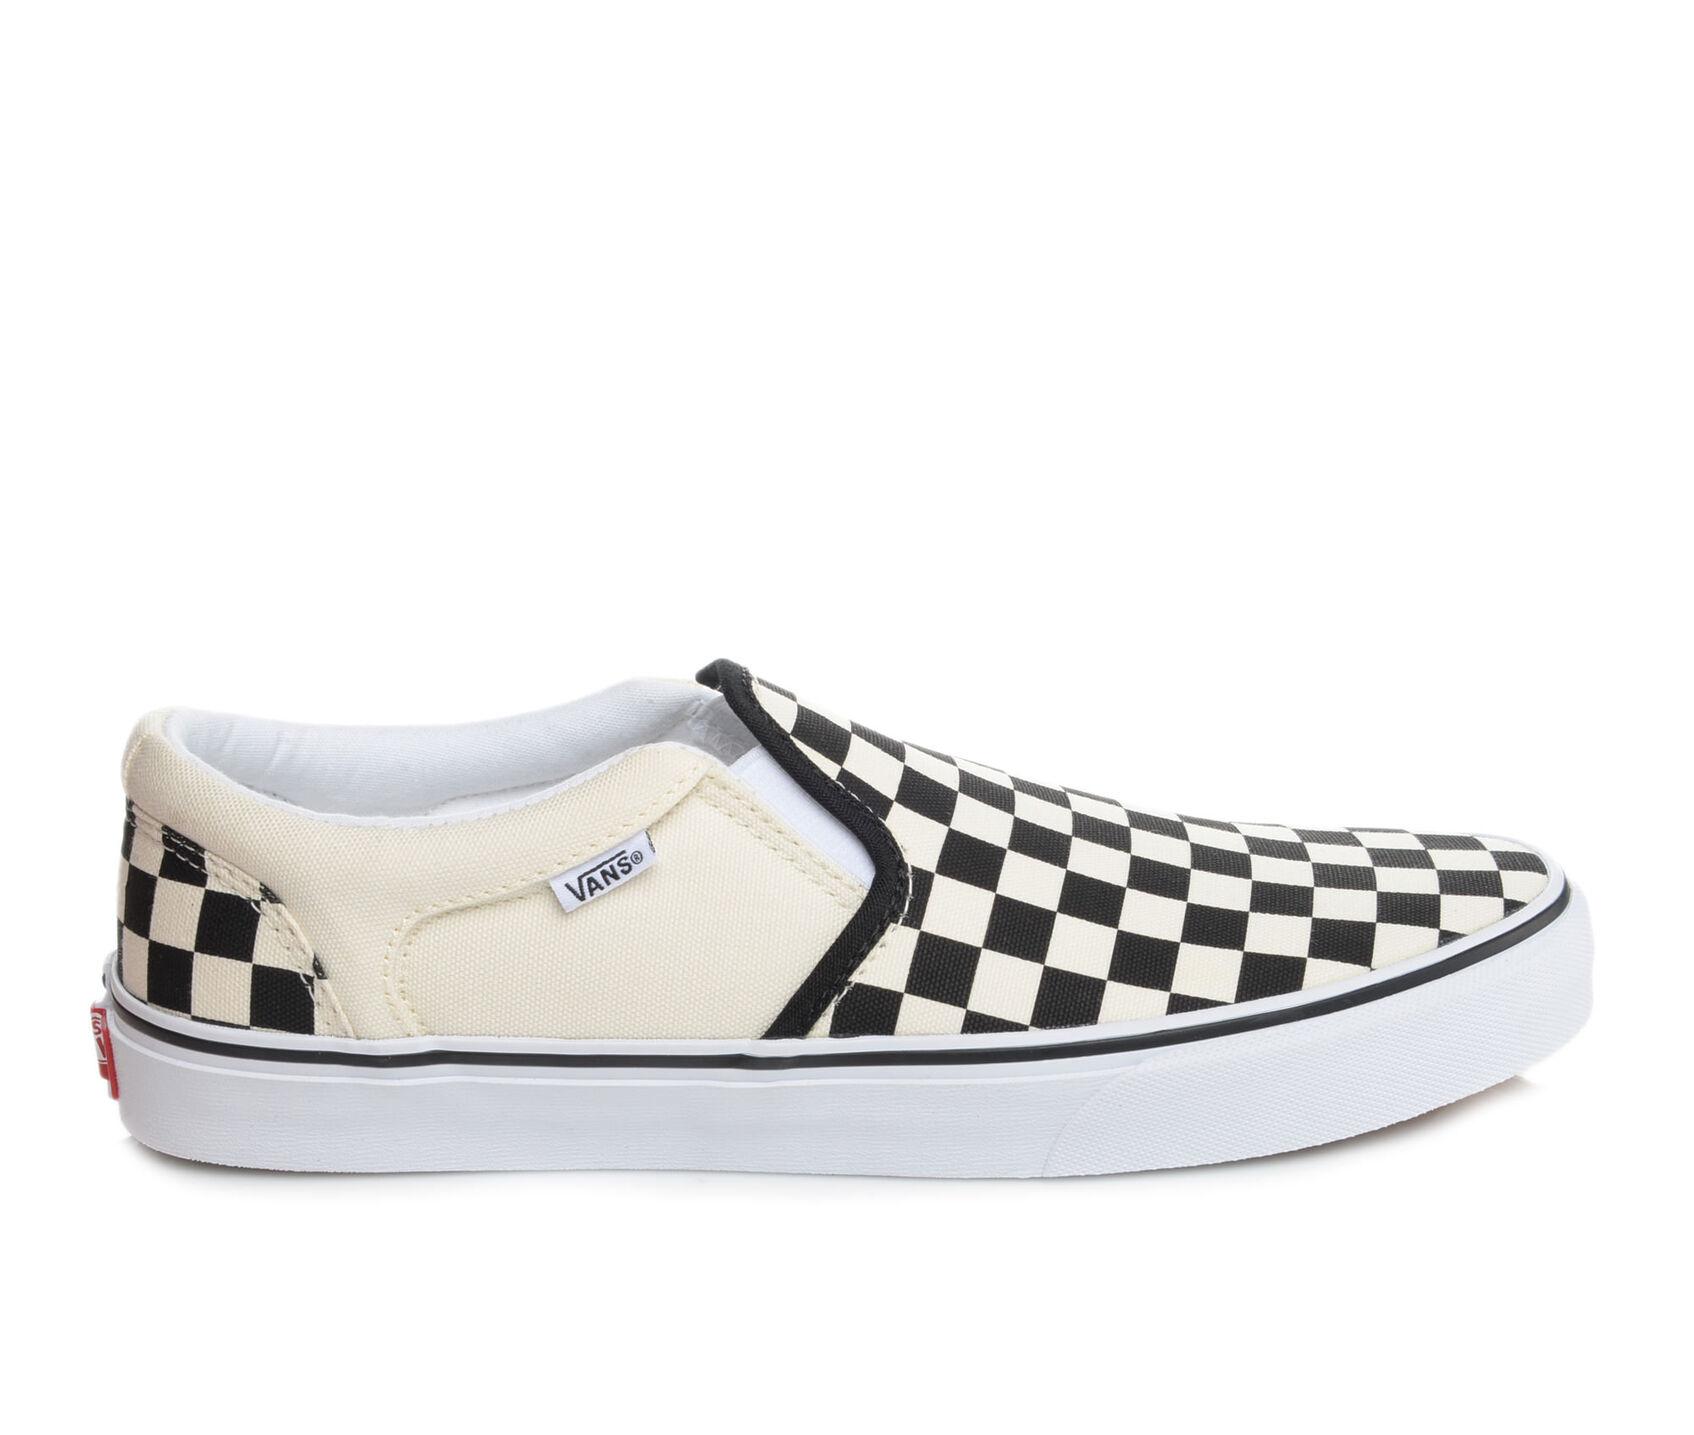 Vans Men S Asher Skate Shoes